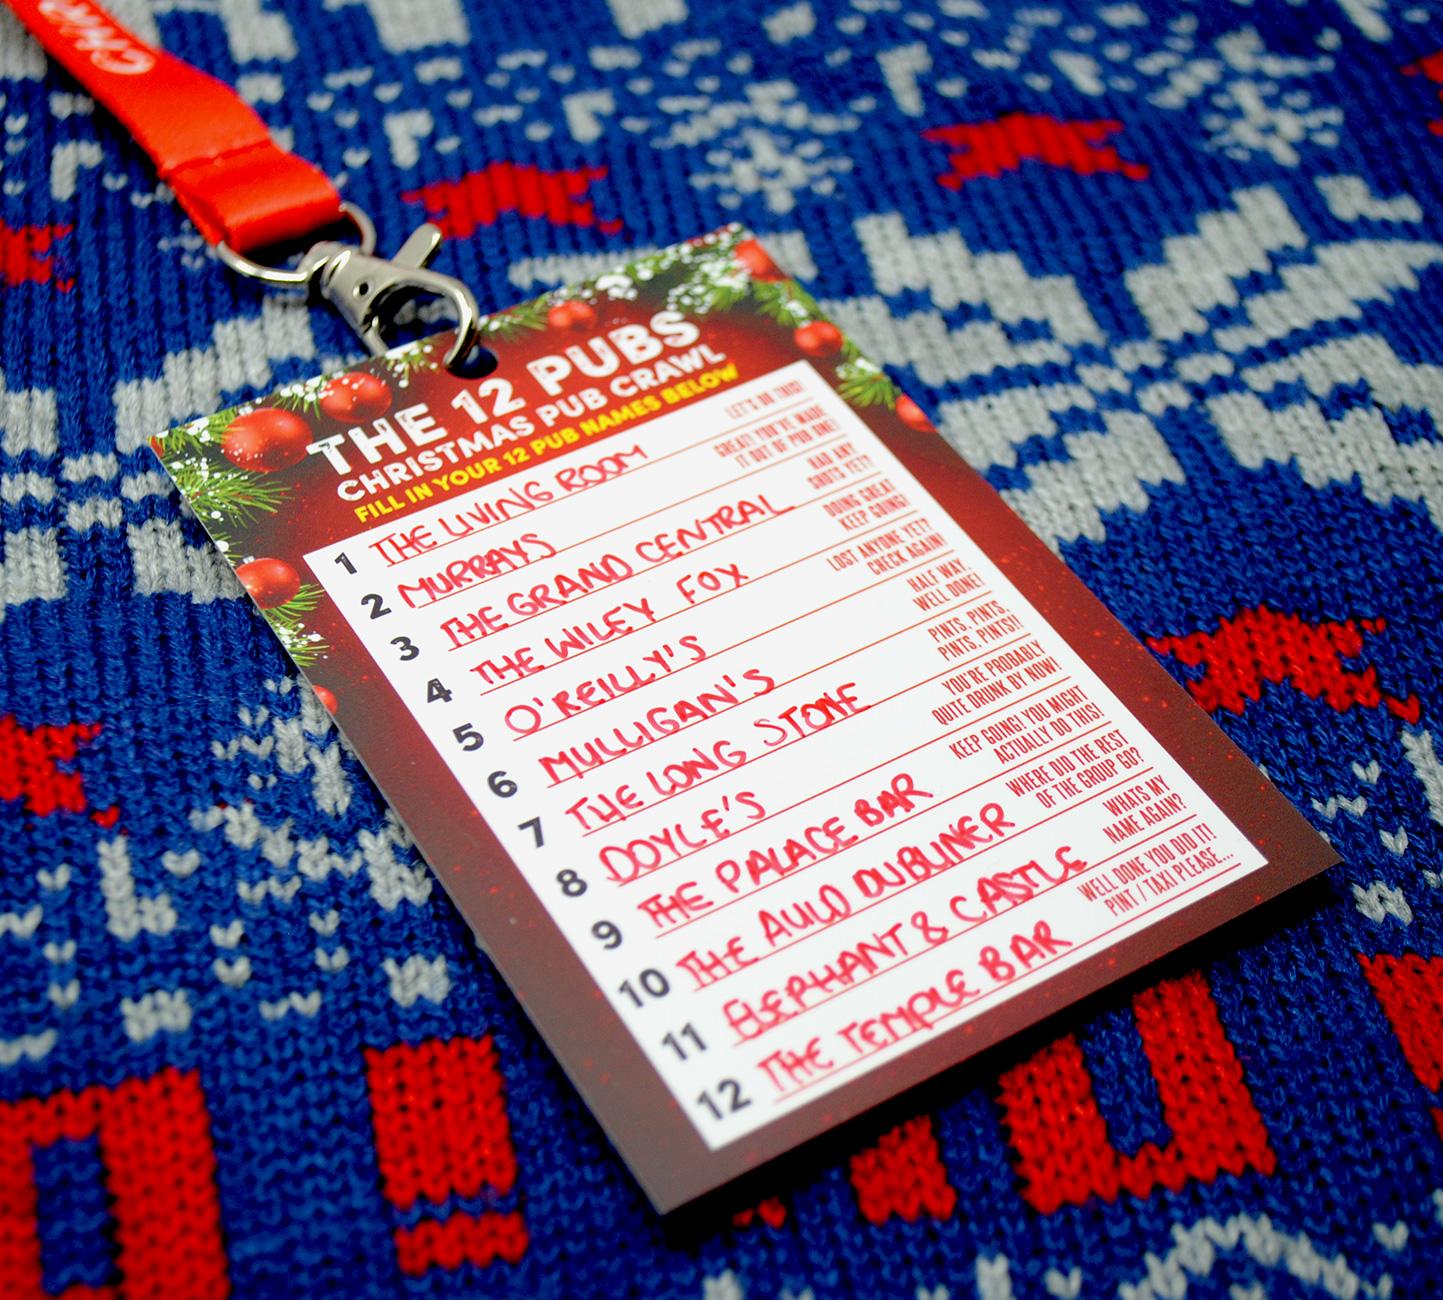 12 pubs of christmas dublin pub crawl guide